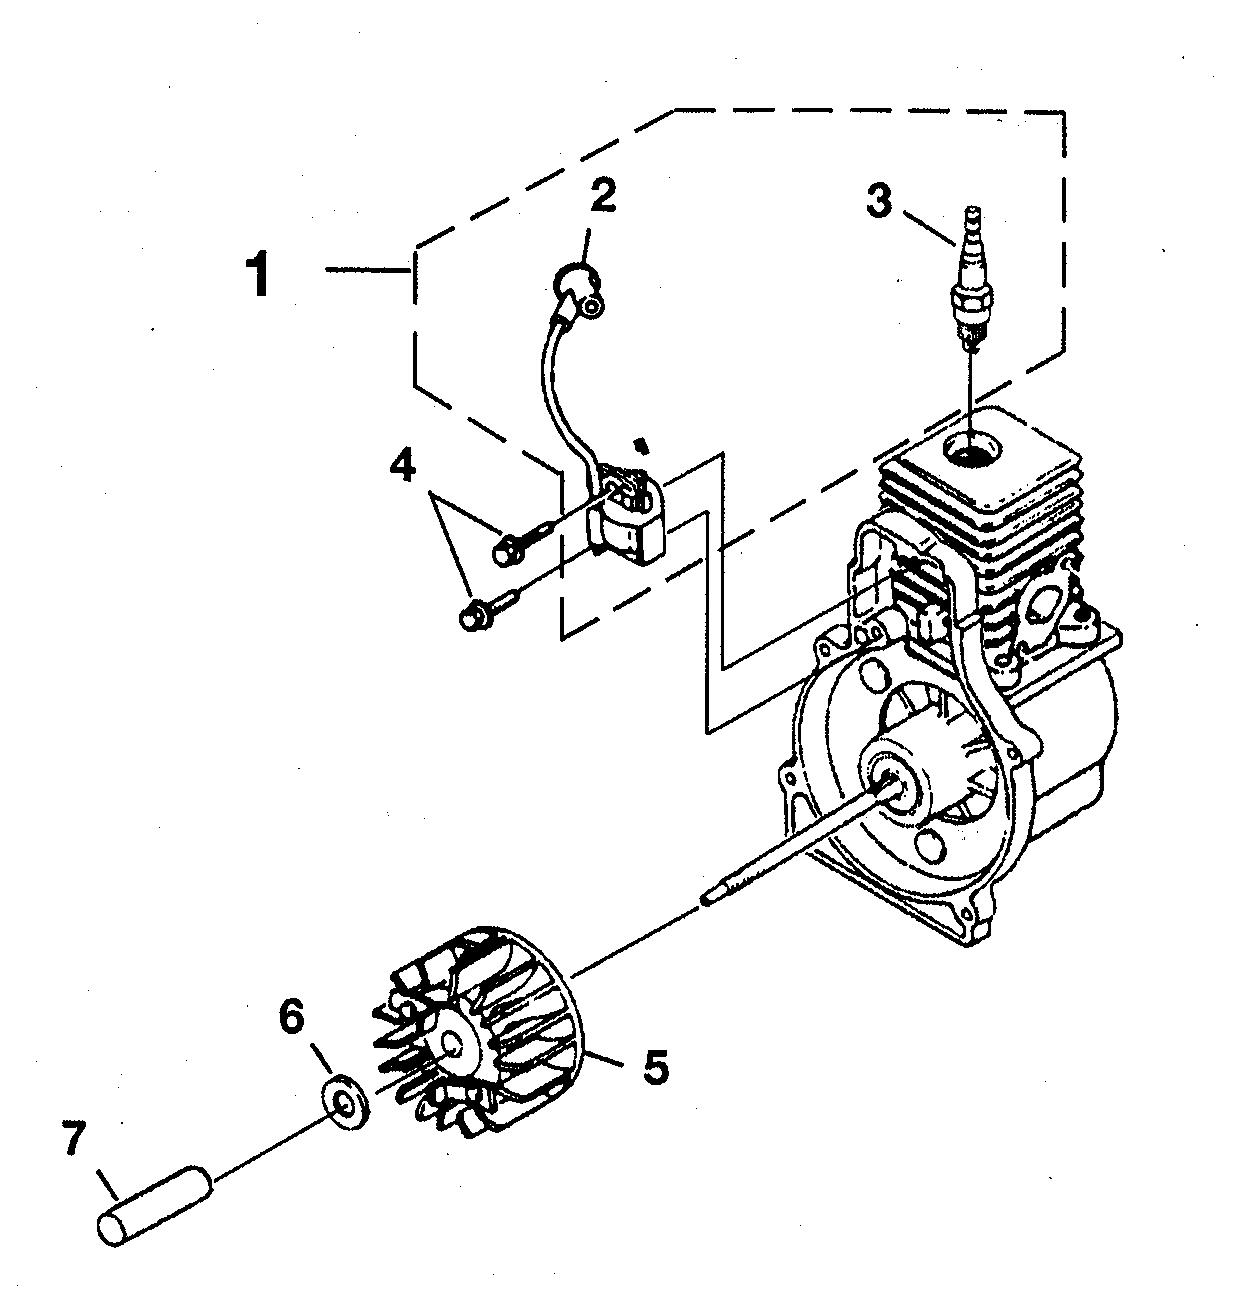 Homelite model UT08930A blower, gas genuine parts